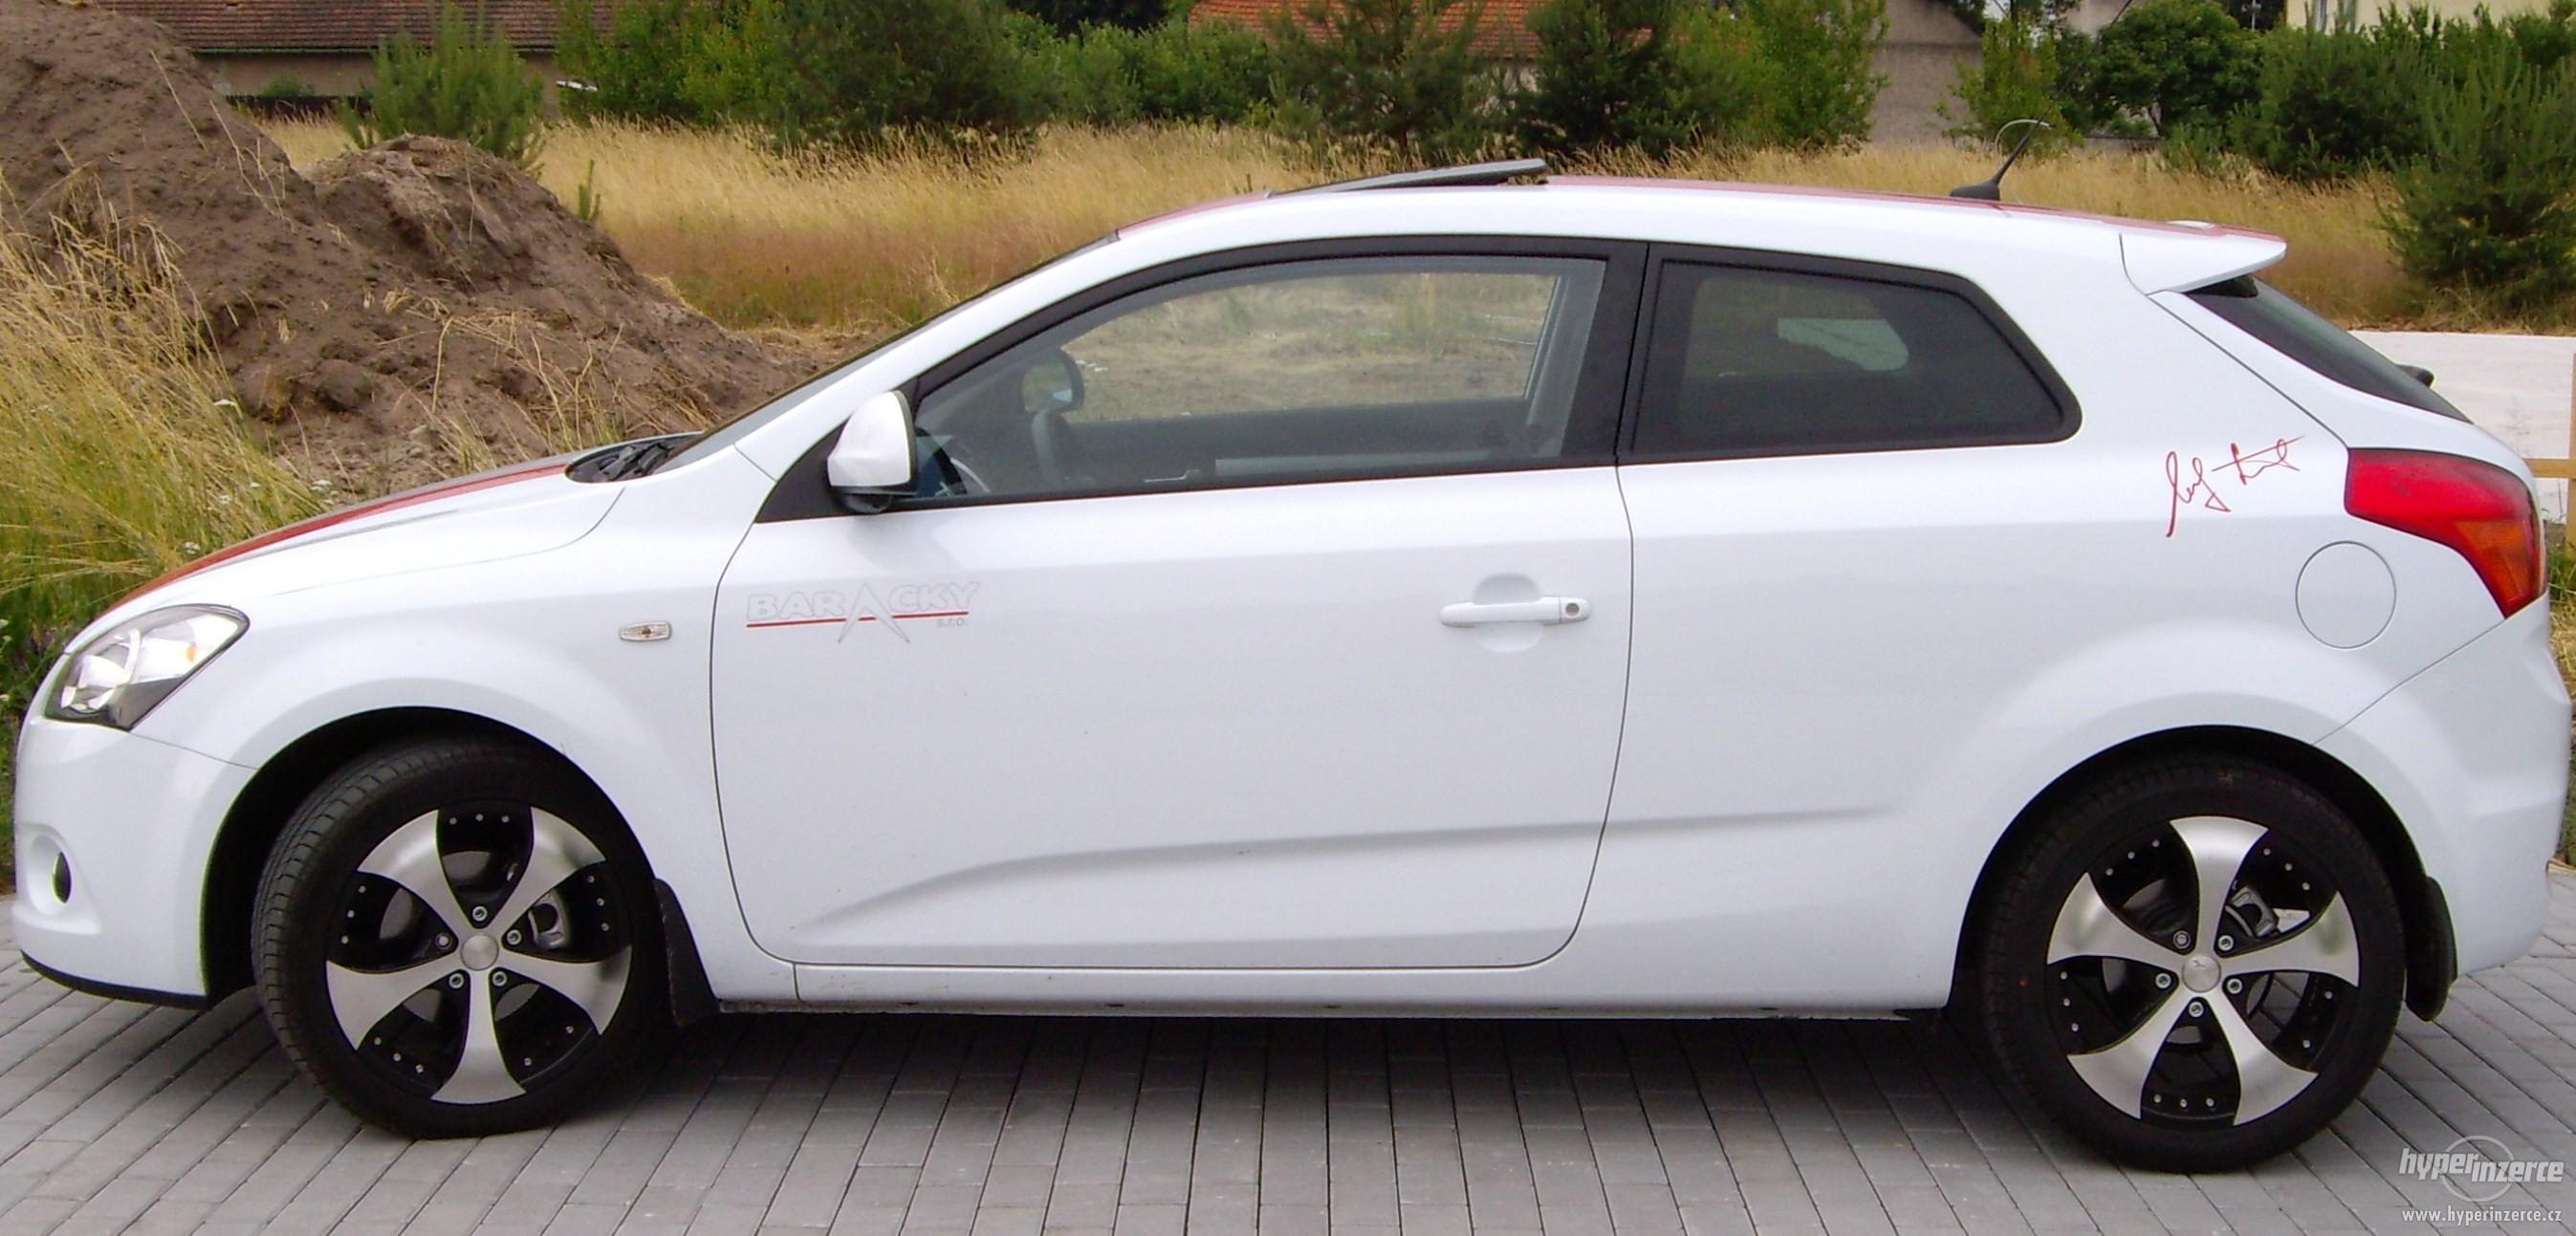 Kia Pro-ceed 2.0 CRDi